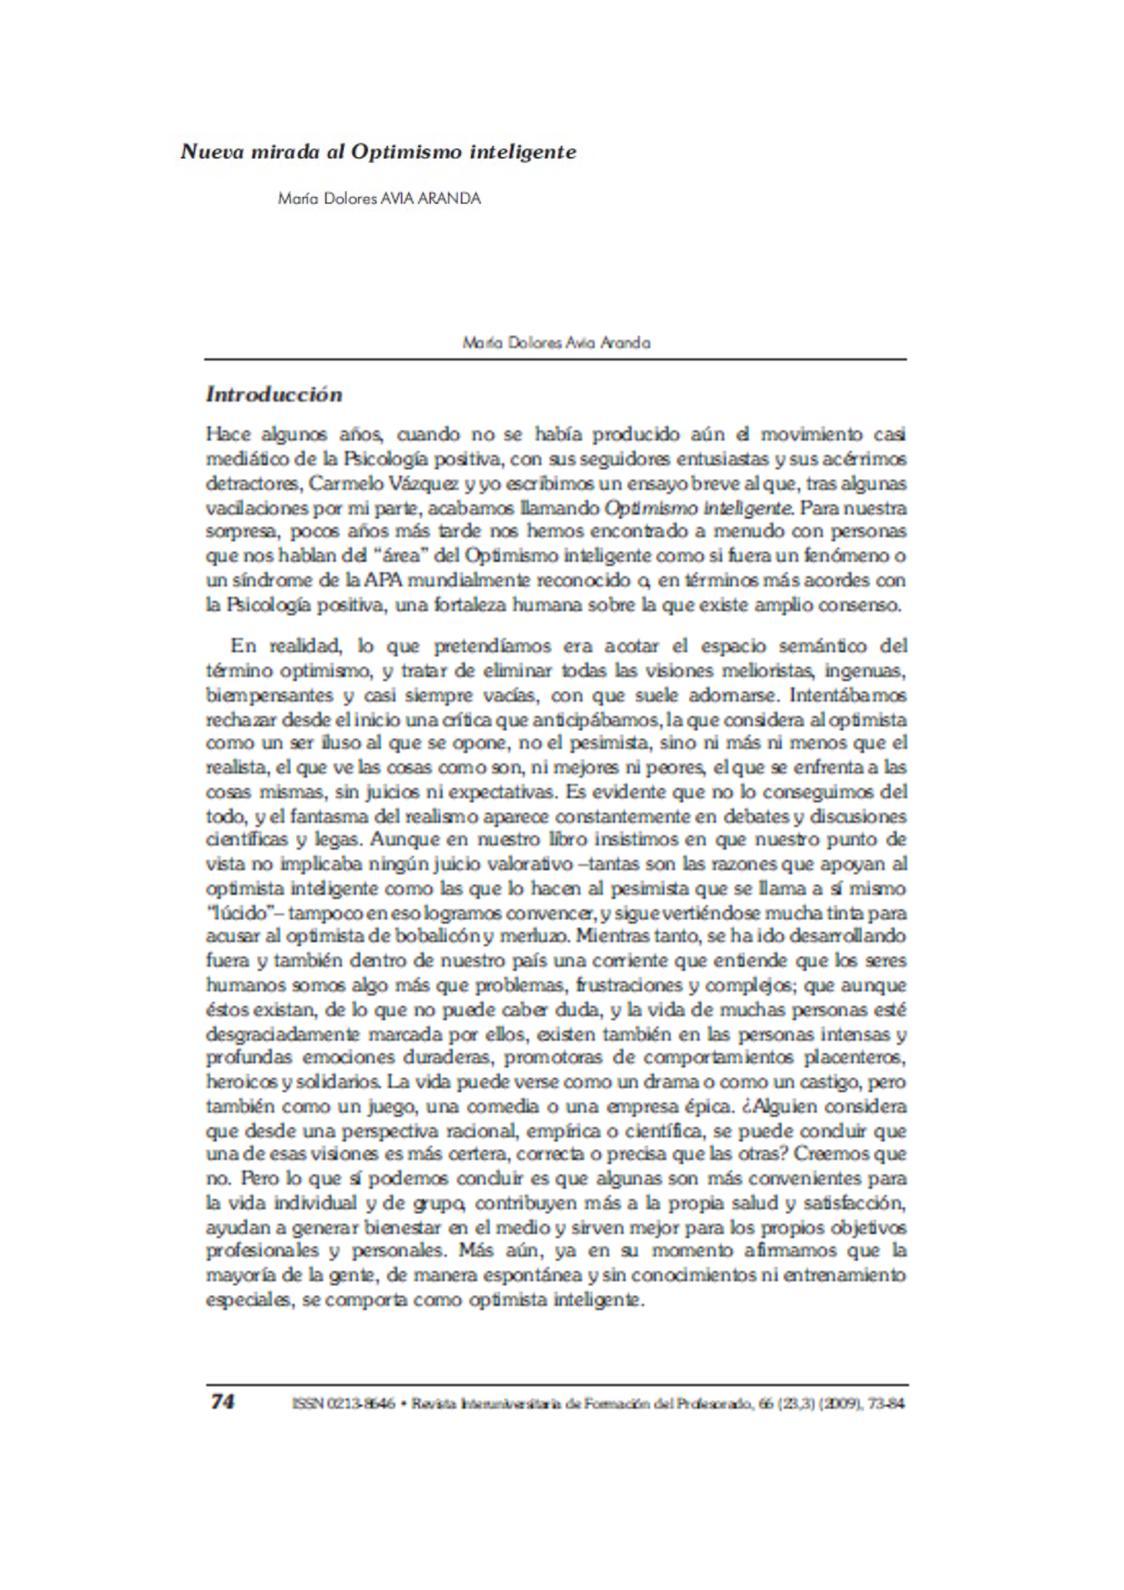 Optimismo Inteligente, Avia Aranda, 2009